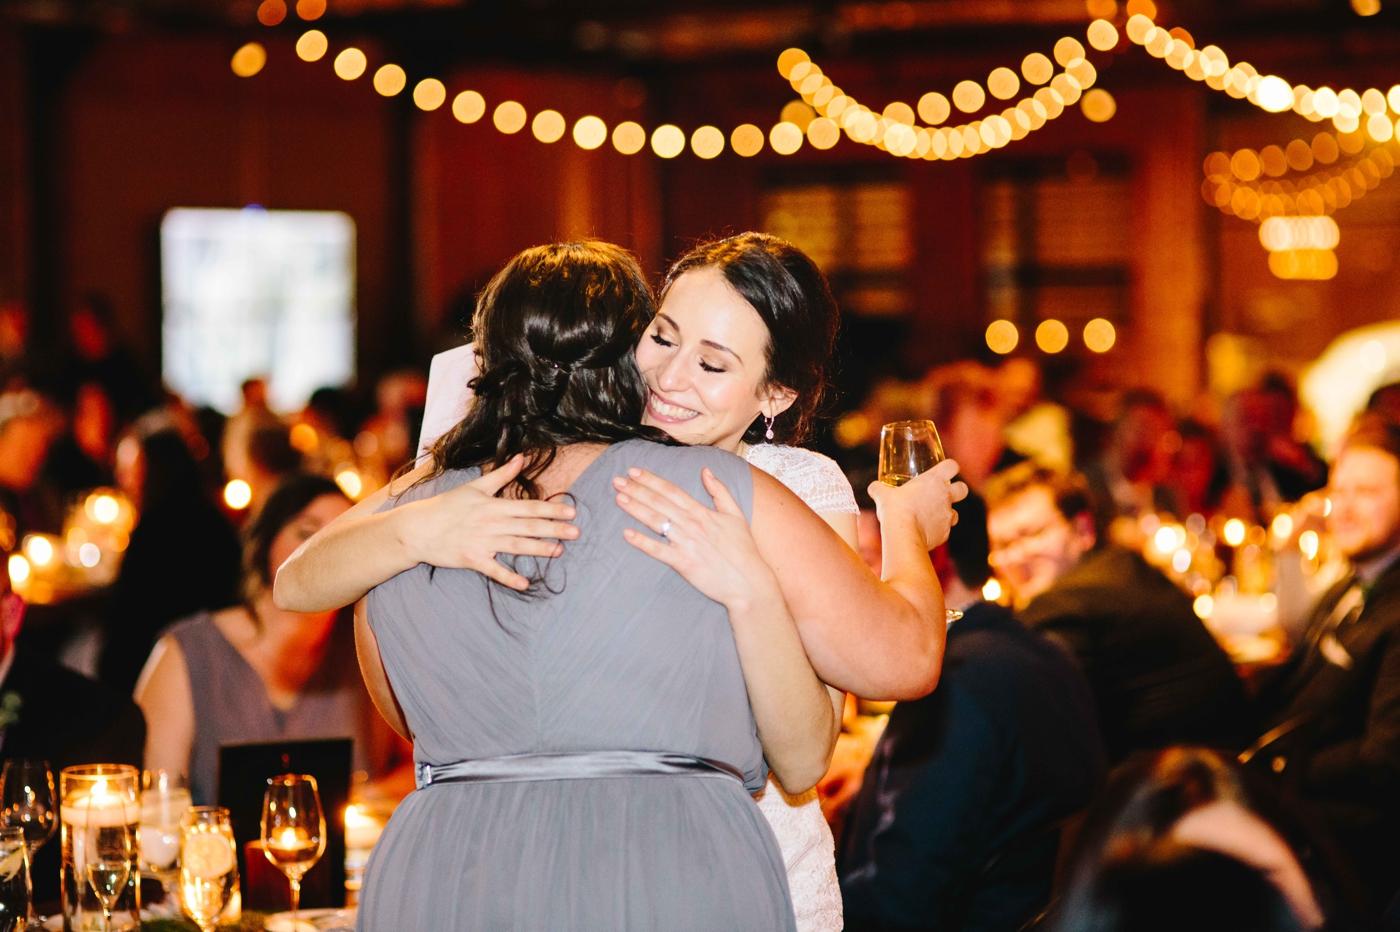 chicago-fine-art-wedding-photography-lintelman44